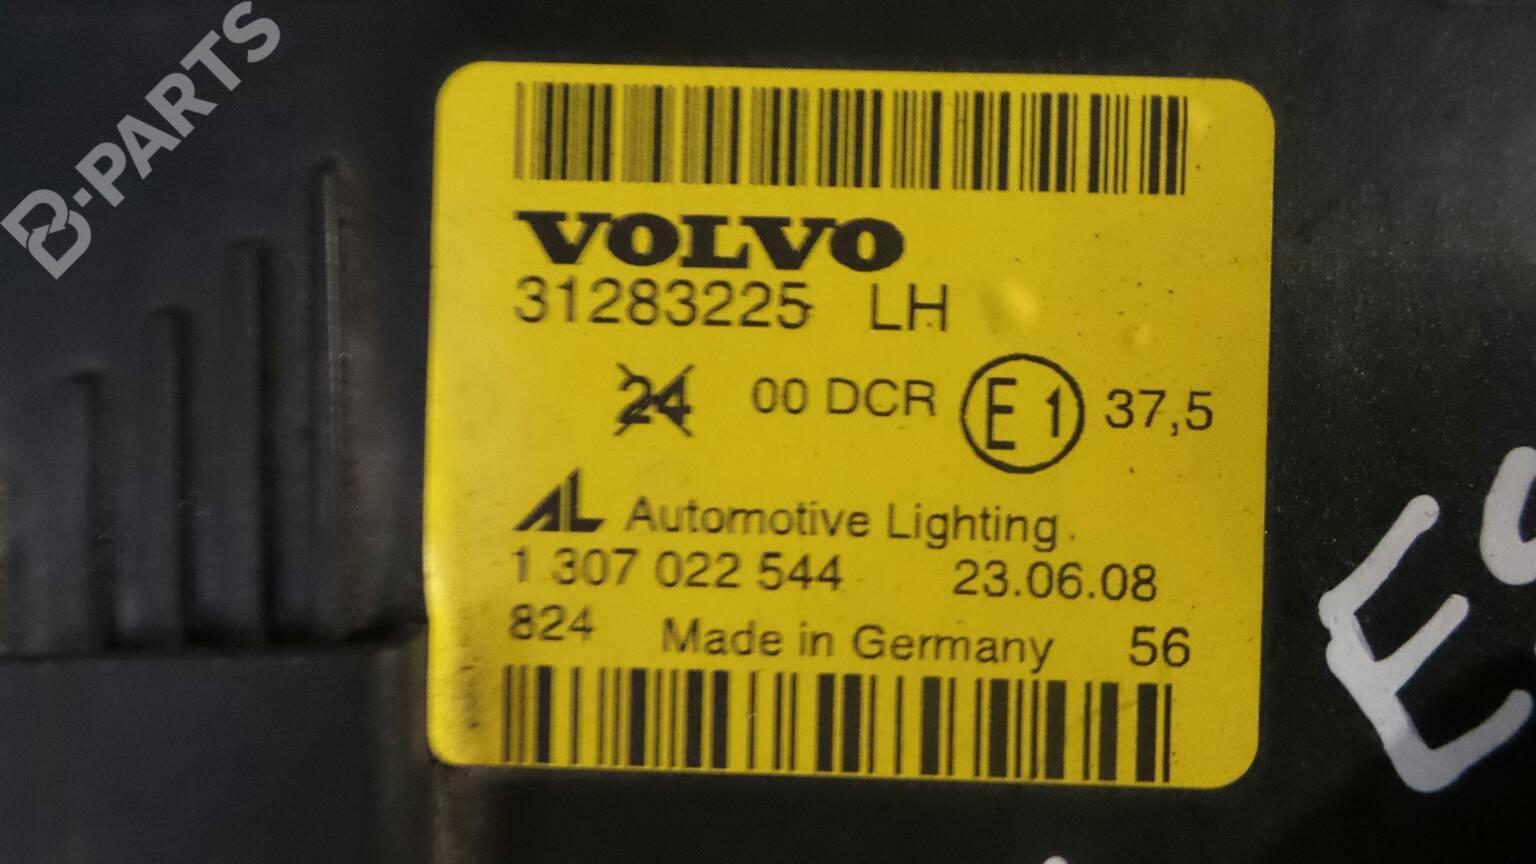 Left Headlight Volvo C70 Ii Convertible 542 56497 Fuse Box 31283225lh 1307022544 2 Doors